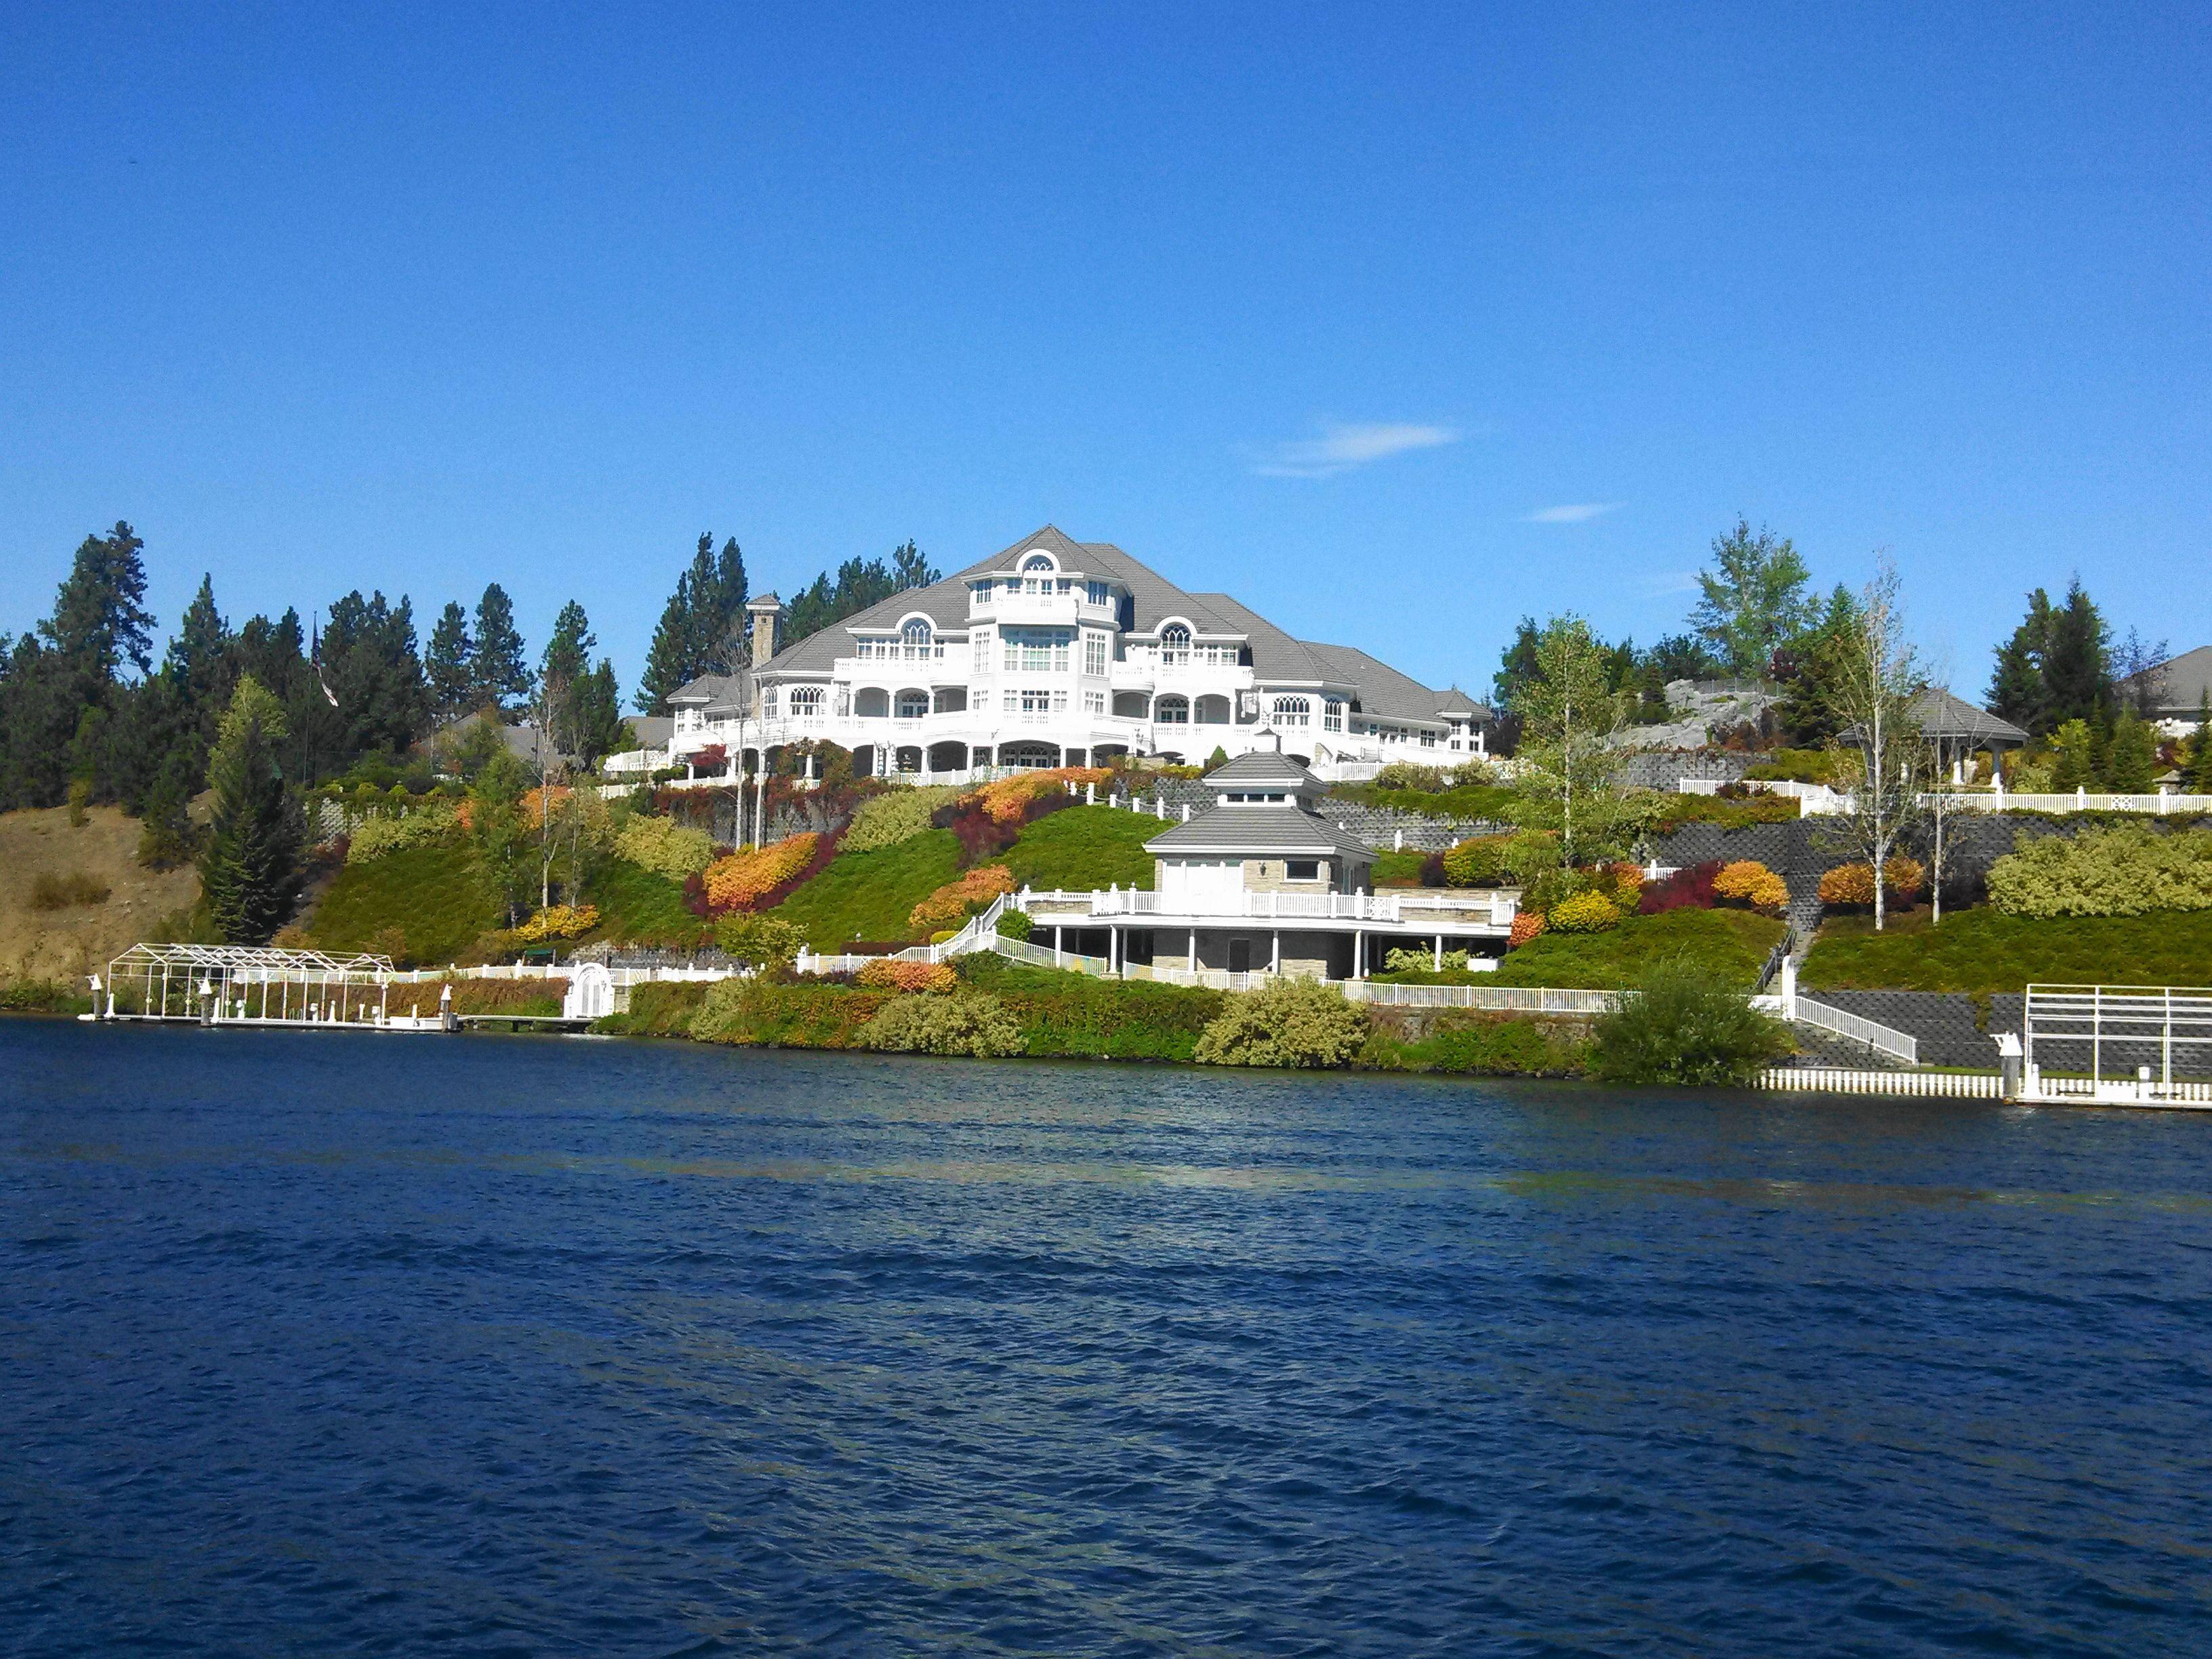 Pin By Dennis C Wheeler On Rving Northwestern United States Mansions Lakefront Living Spokane River